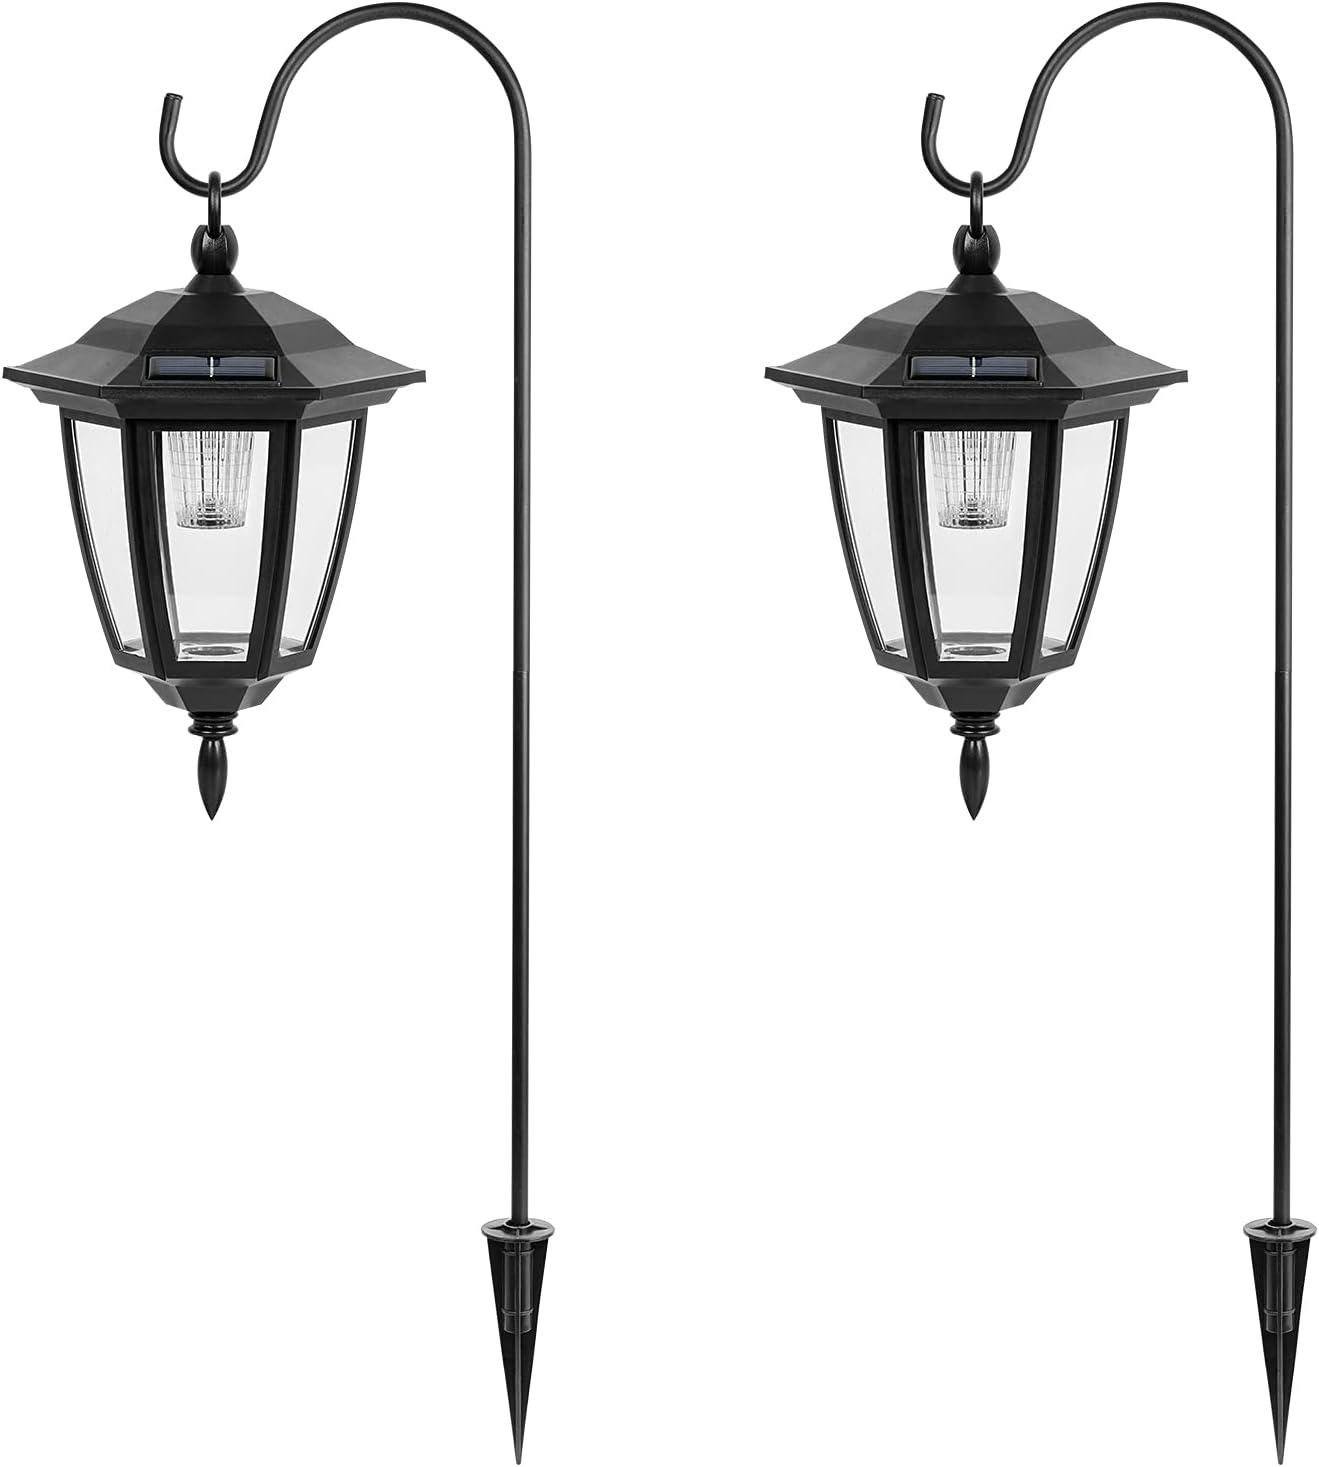 Viewsun 34 Inch Solar Hanging Lights, Shepherd Hook Lights with 2 Shepherd Hooks Weatherproof Outdoor Decorative Solar Lantern Lights for Garden, Backyard, Pathway, 2 Pack